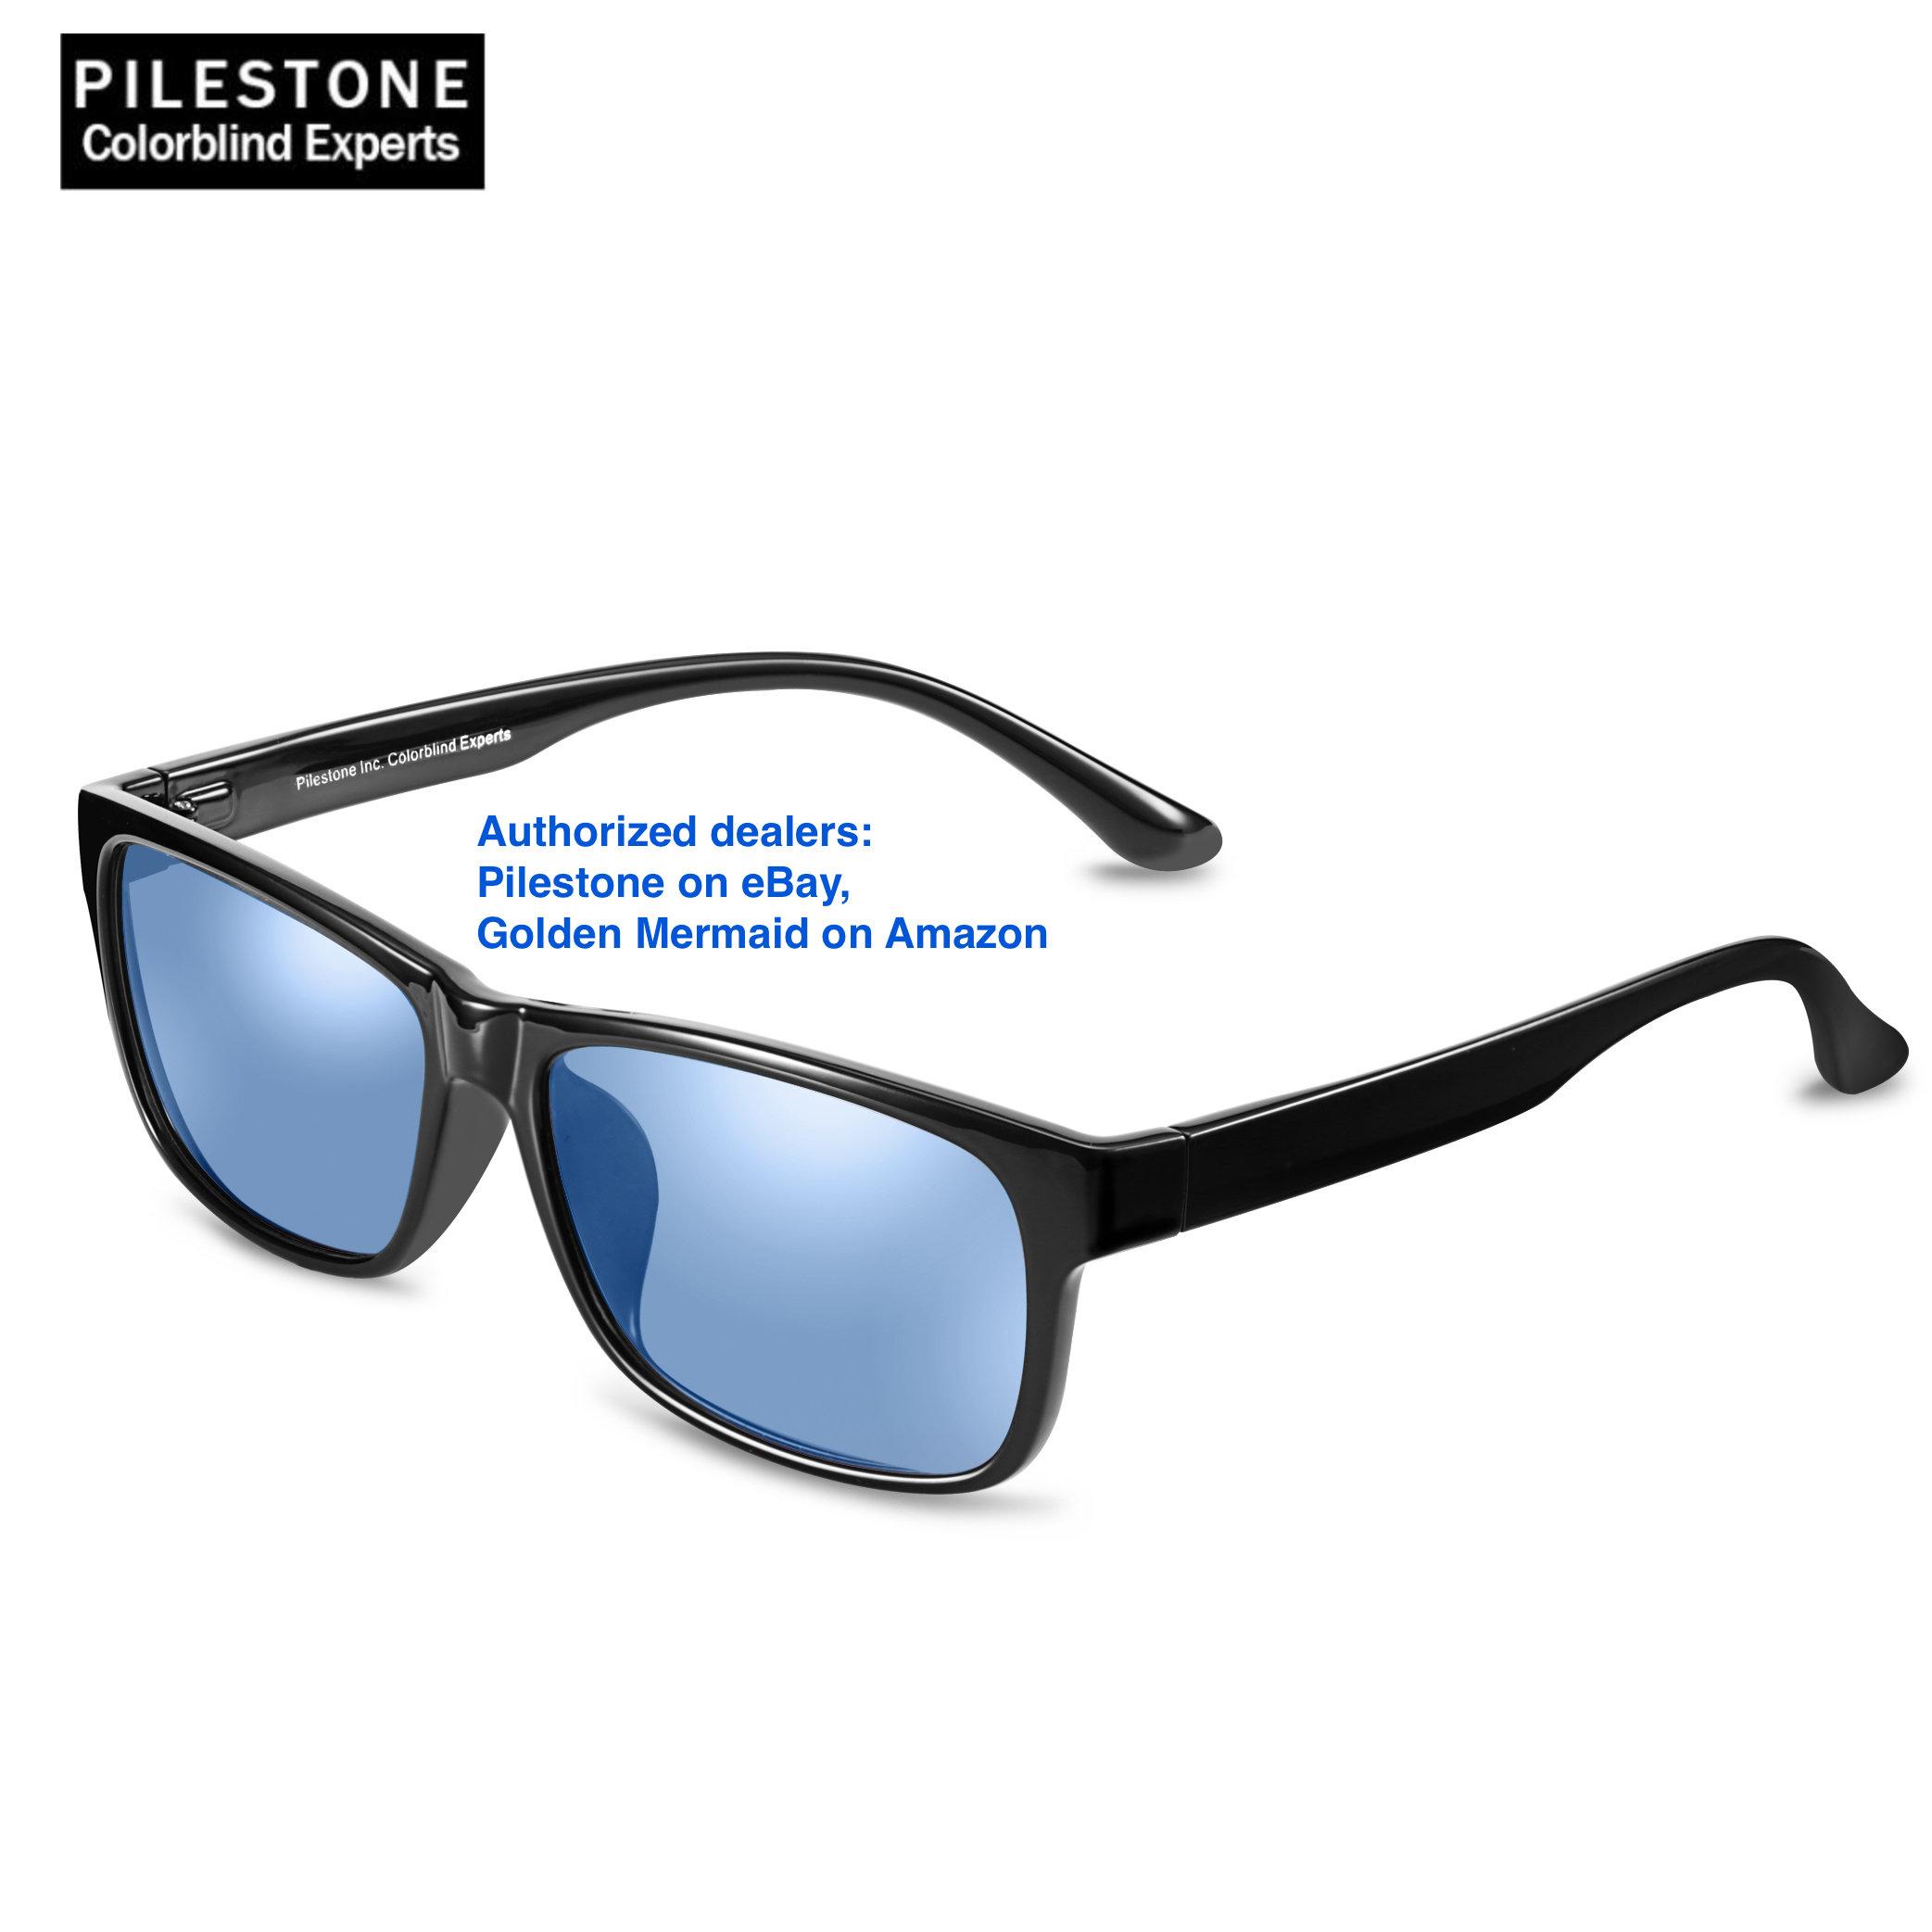 b031e2b672 Pilestone TP-020 Color Blind Corrective Glasses for Color Blindness